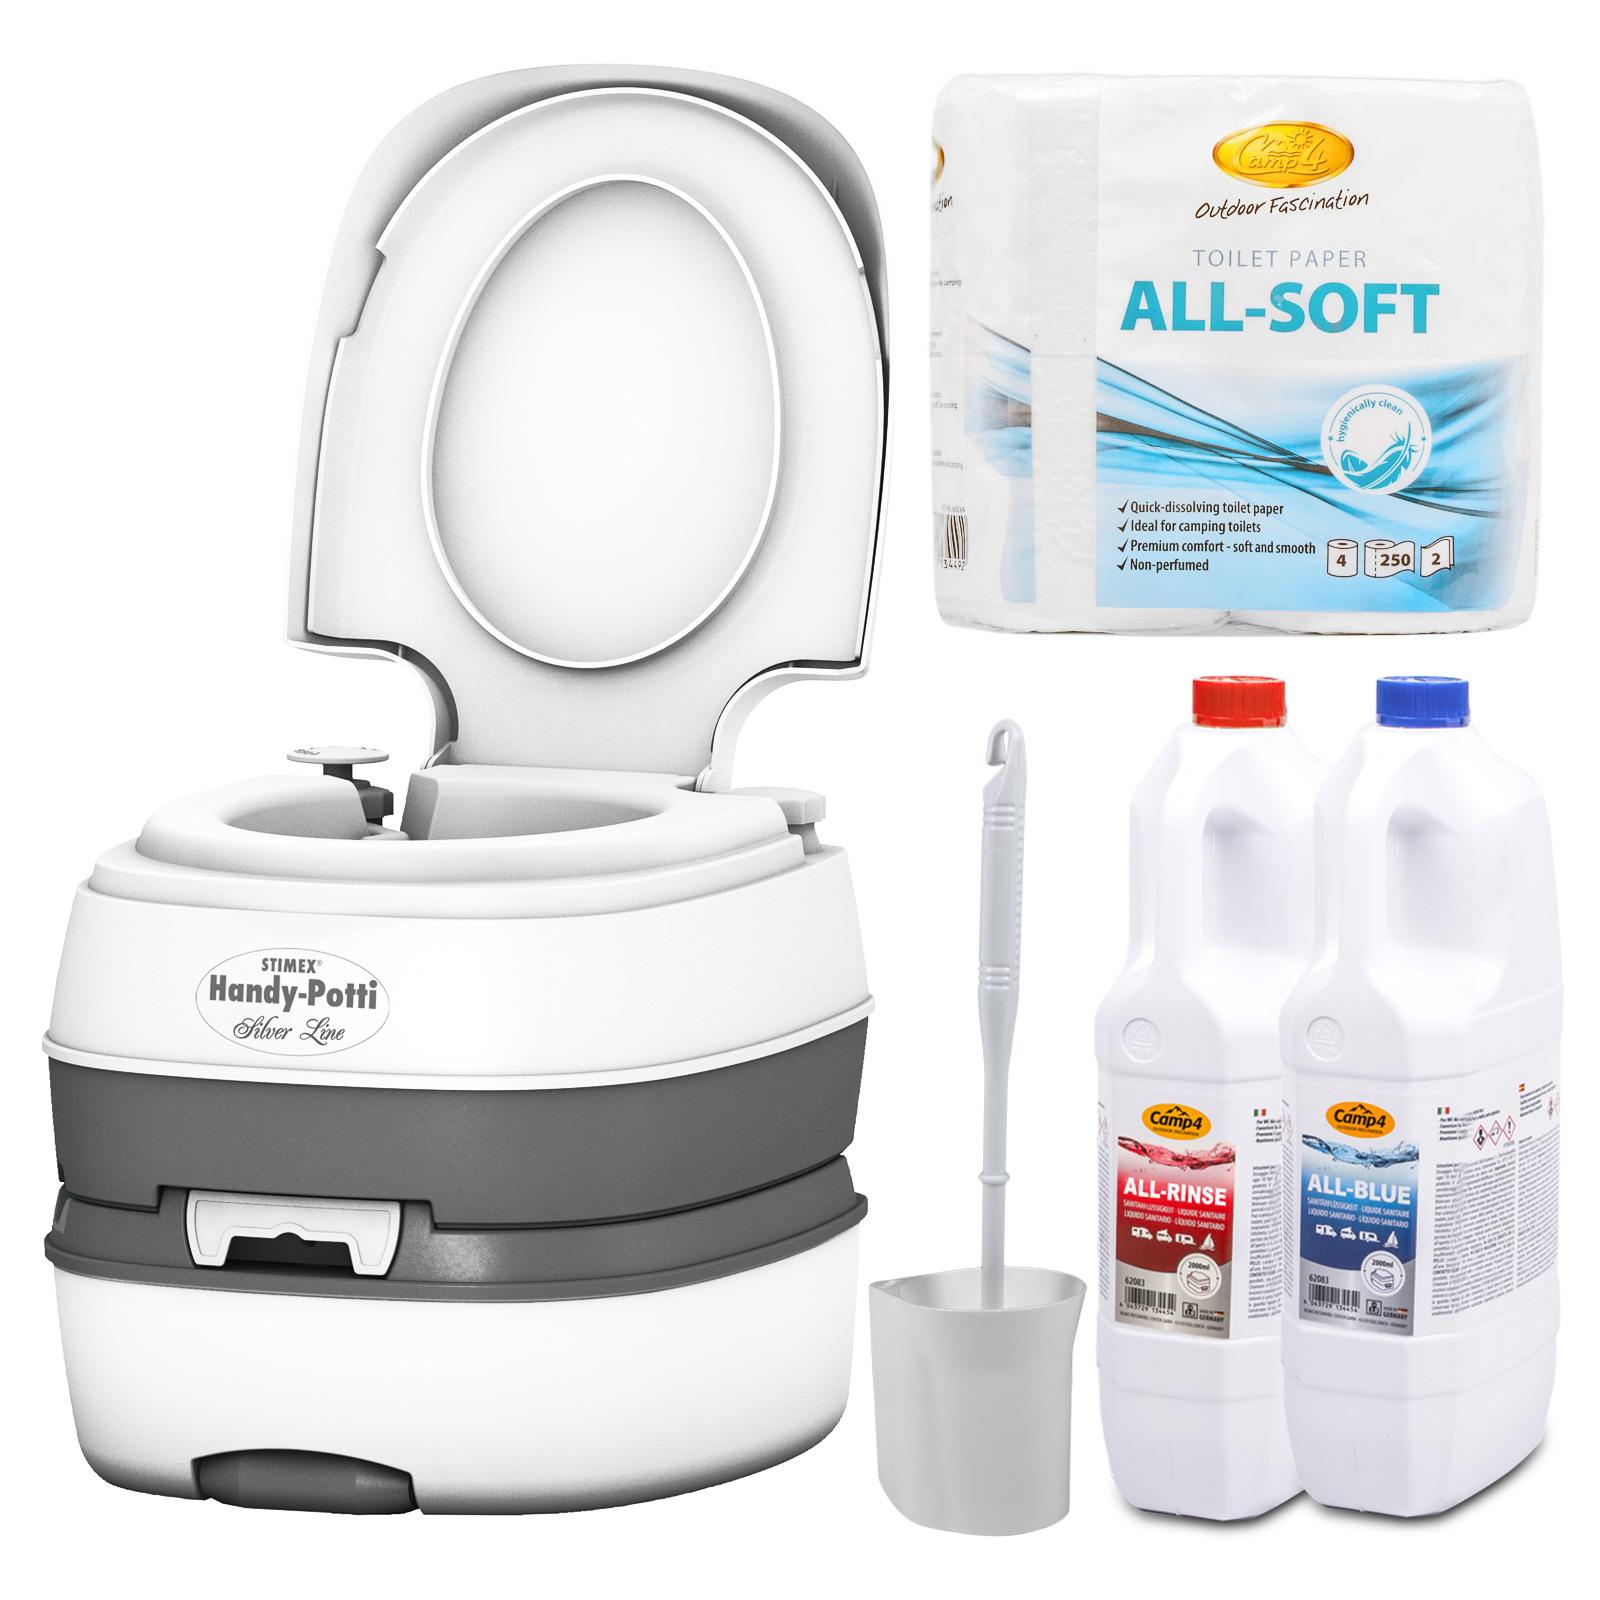 STIMEX Campingtoilette + All-Soft + All Rinse + All Blue + Toilettenbürste